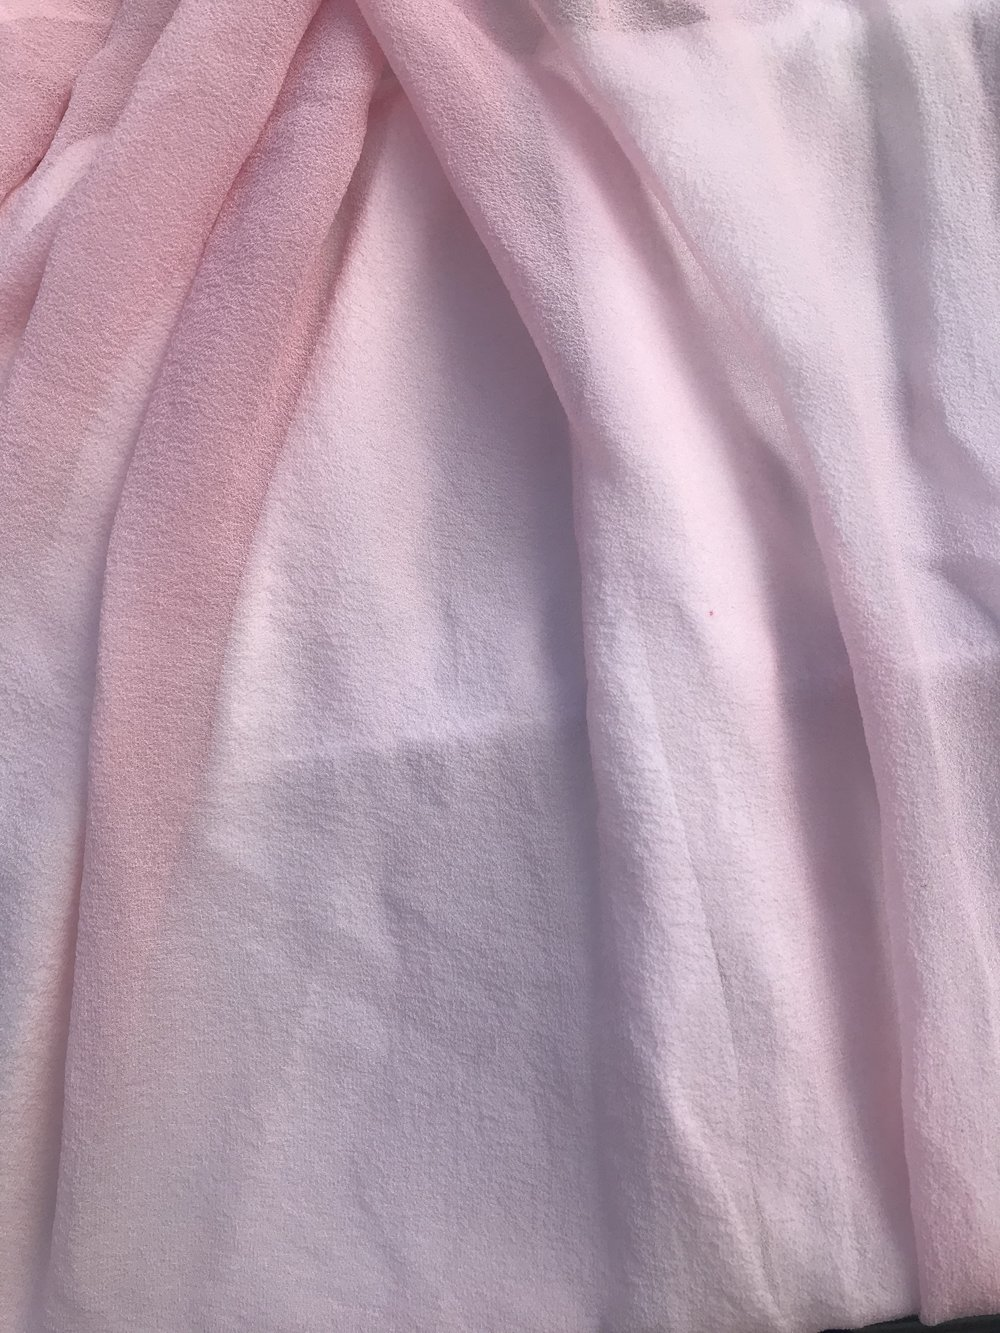 diy wedding dress dye colors